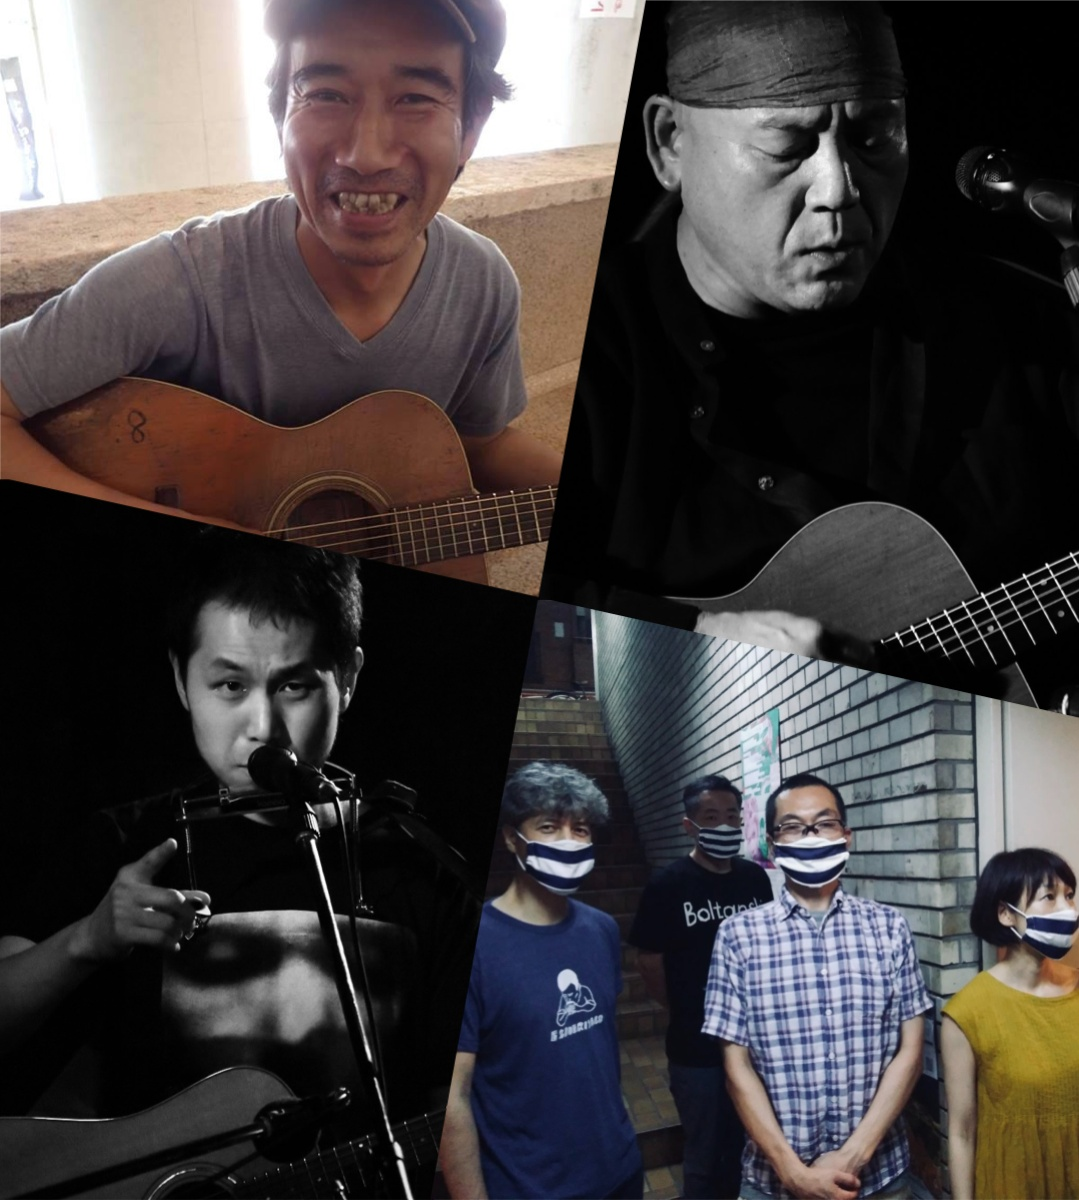 『ROCK' N' ROLL CIRCUS』出演:友情山脈 / 坂井ライ / 中馬すすむ / 野口明伸